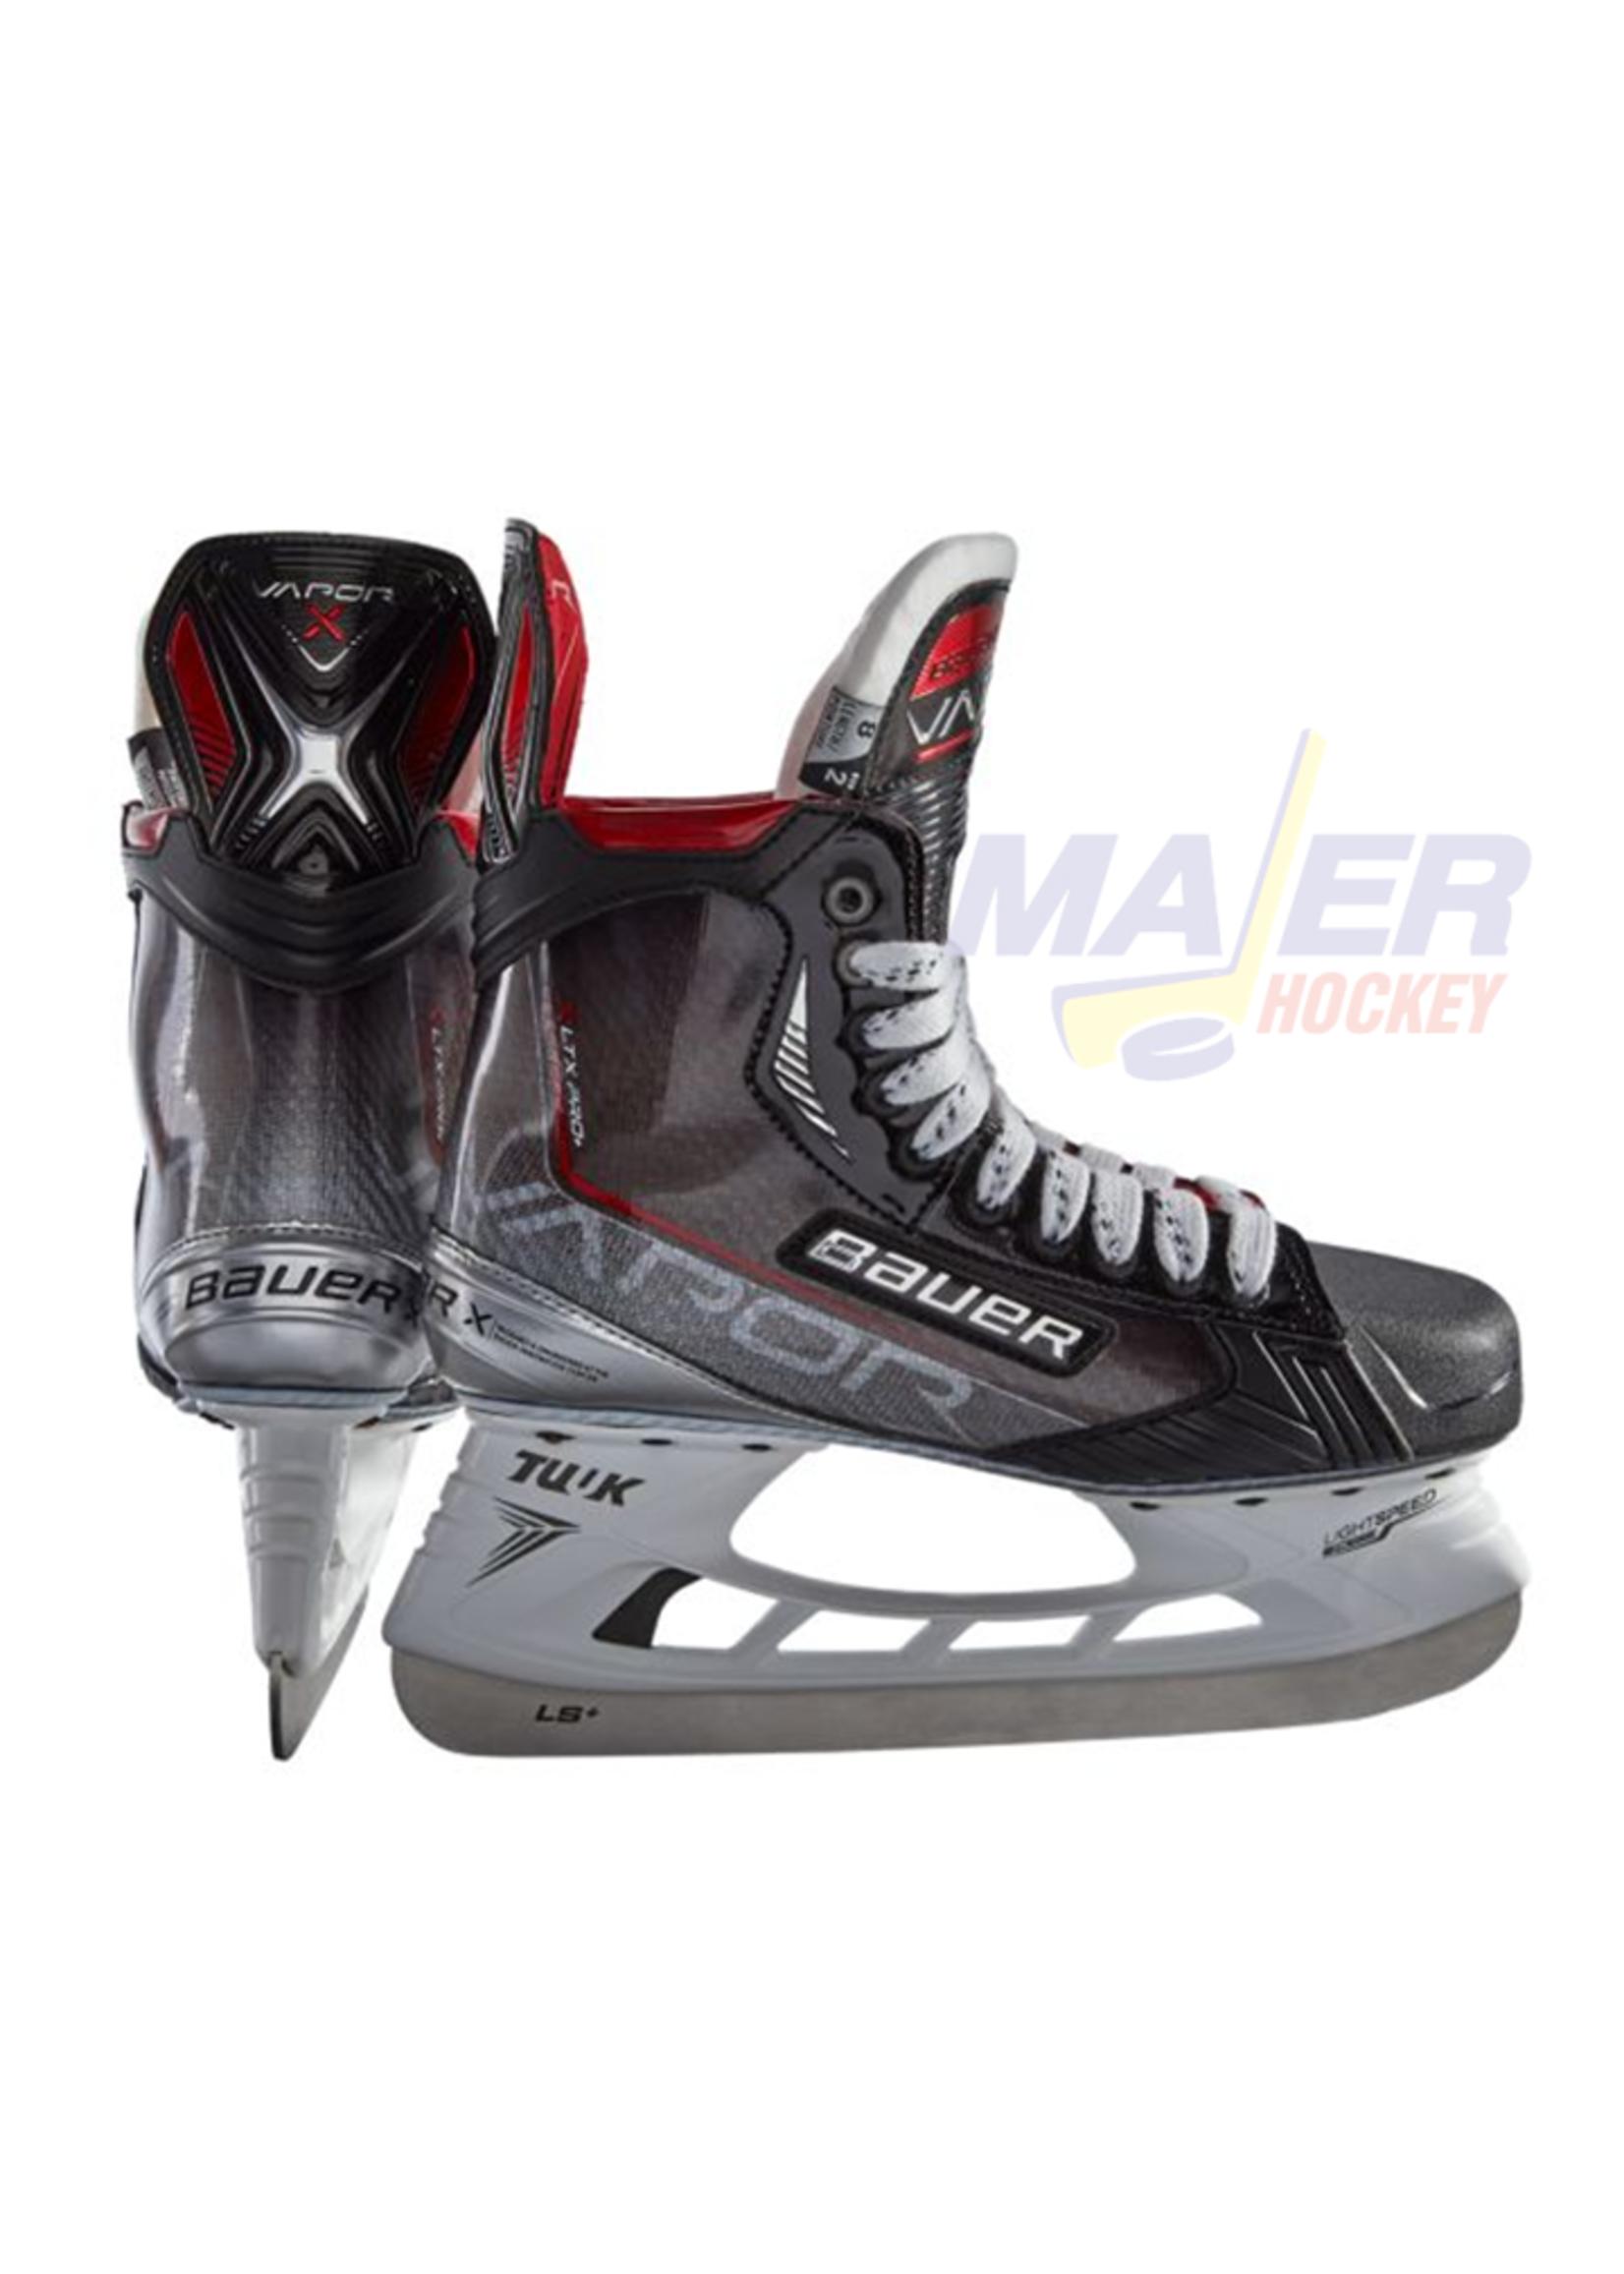 Bauer Vapor XLTX Pro+ Int Skates